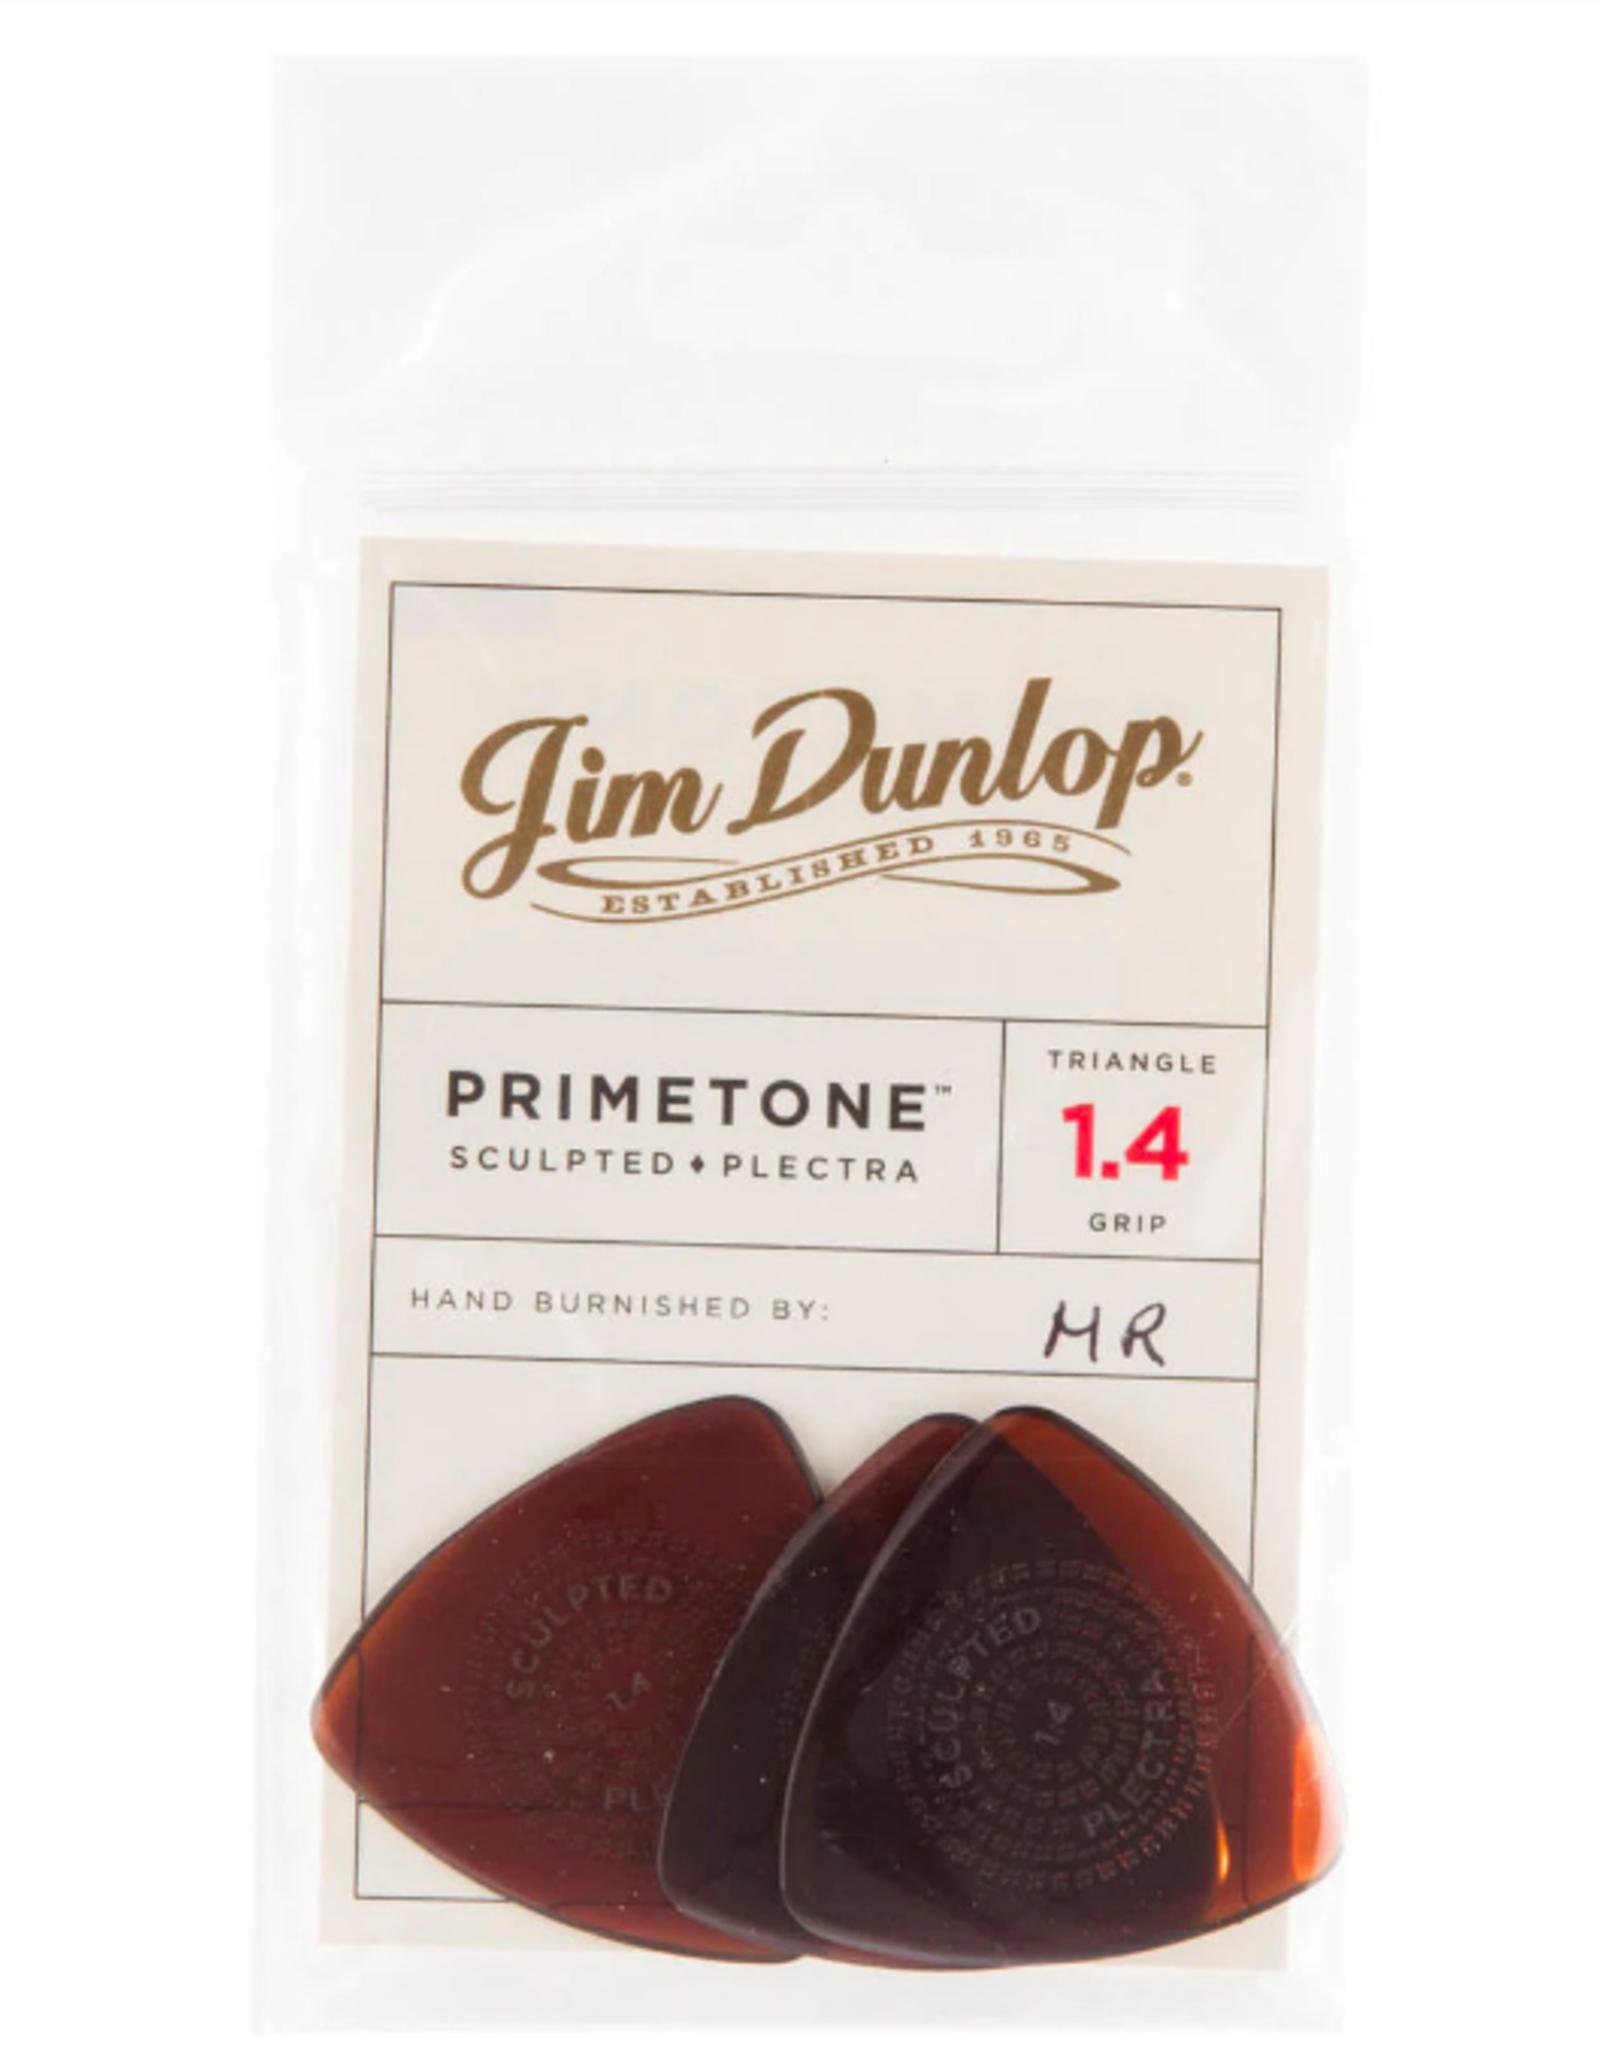 Dunlop Dunlop Primetone 1.4 Triangle Grip Pick Player Pack (3 Picks)